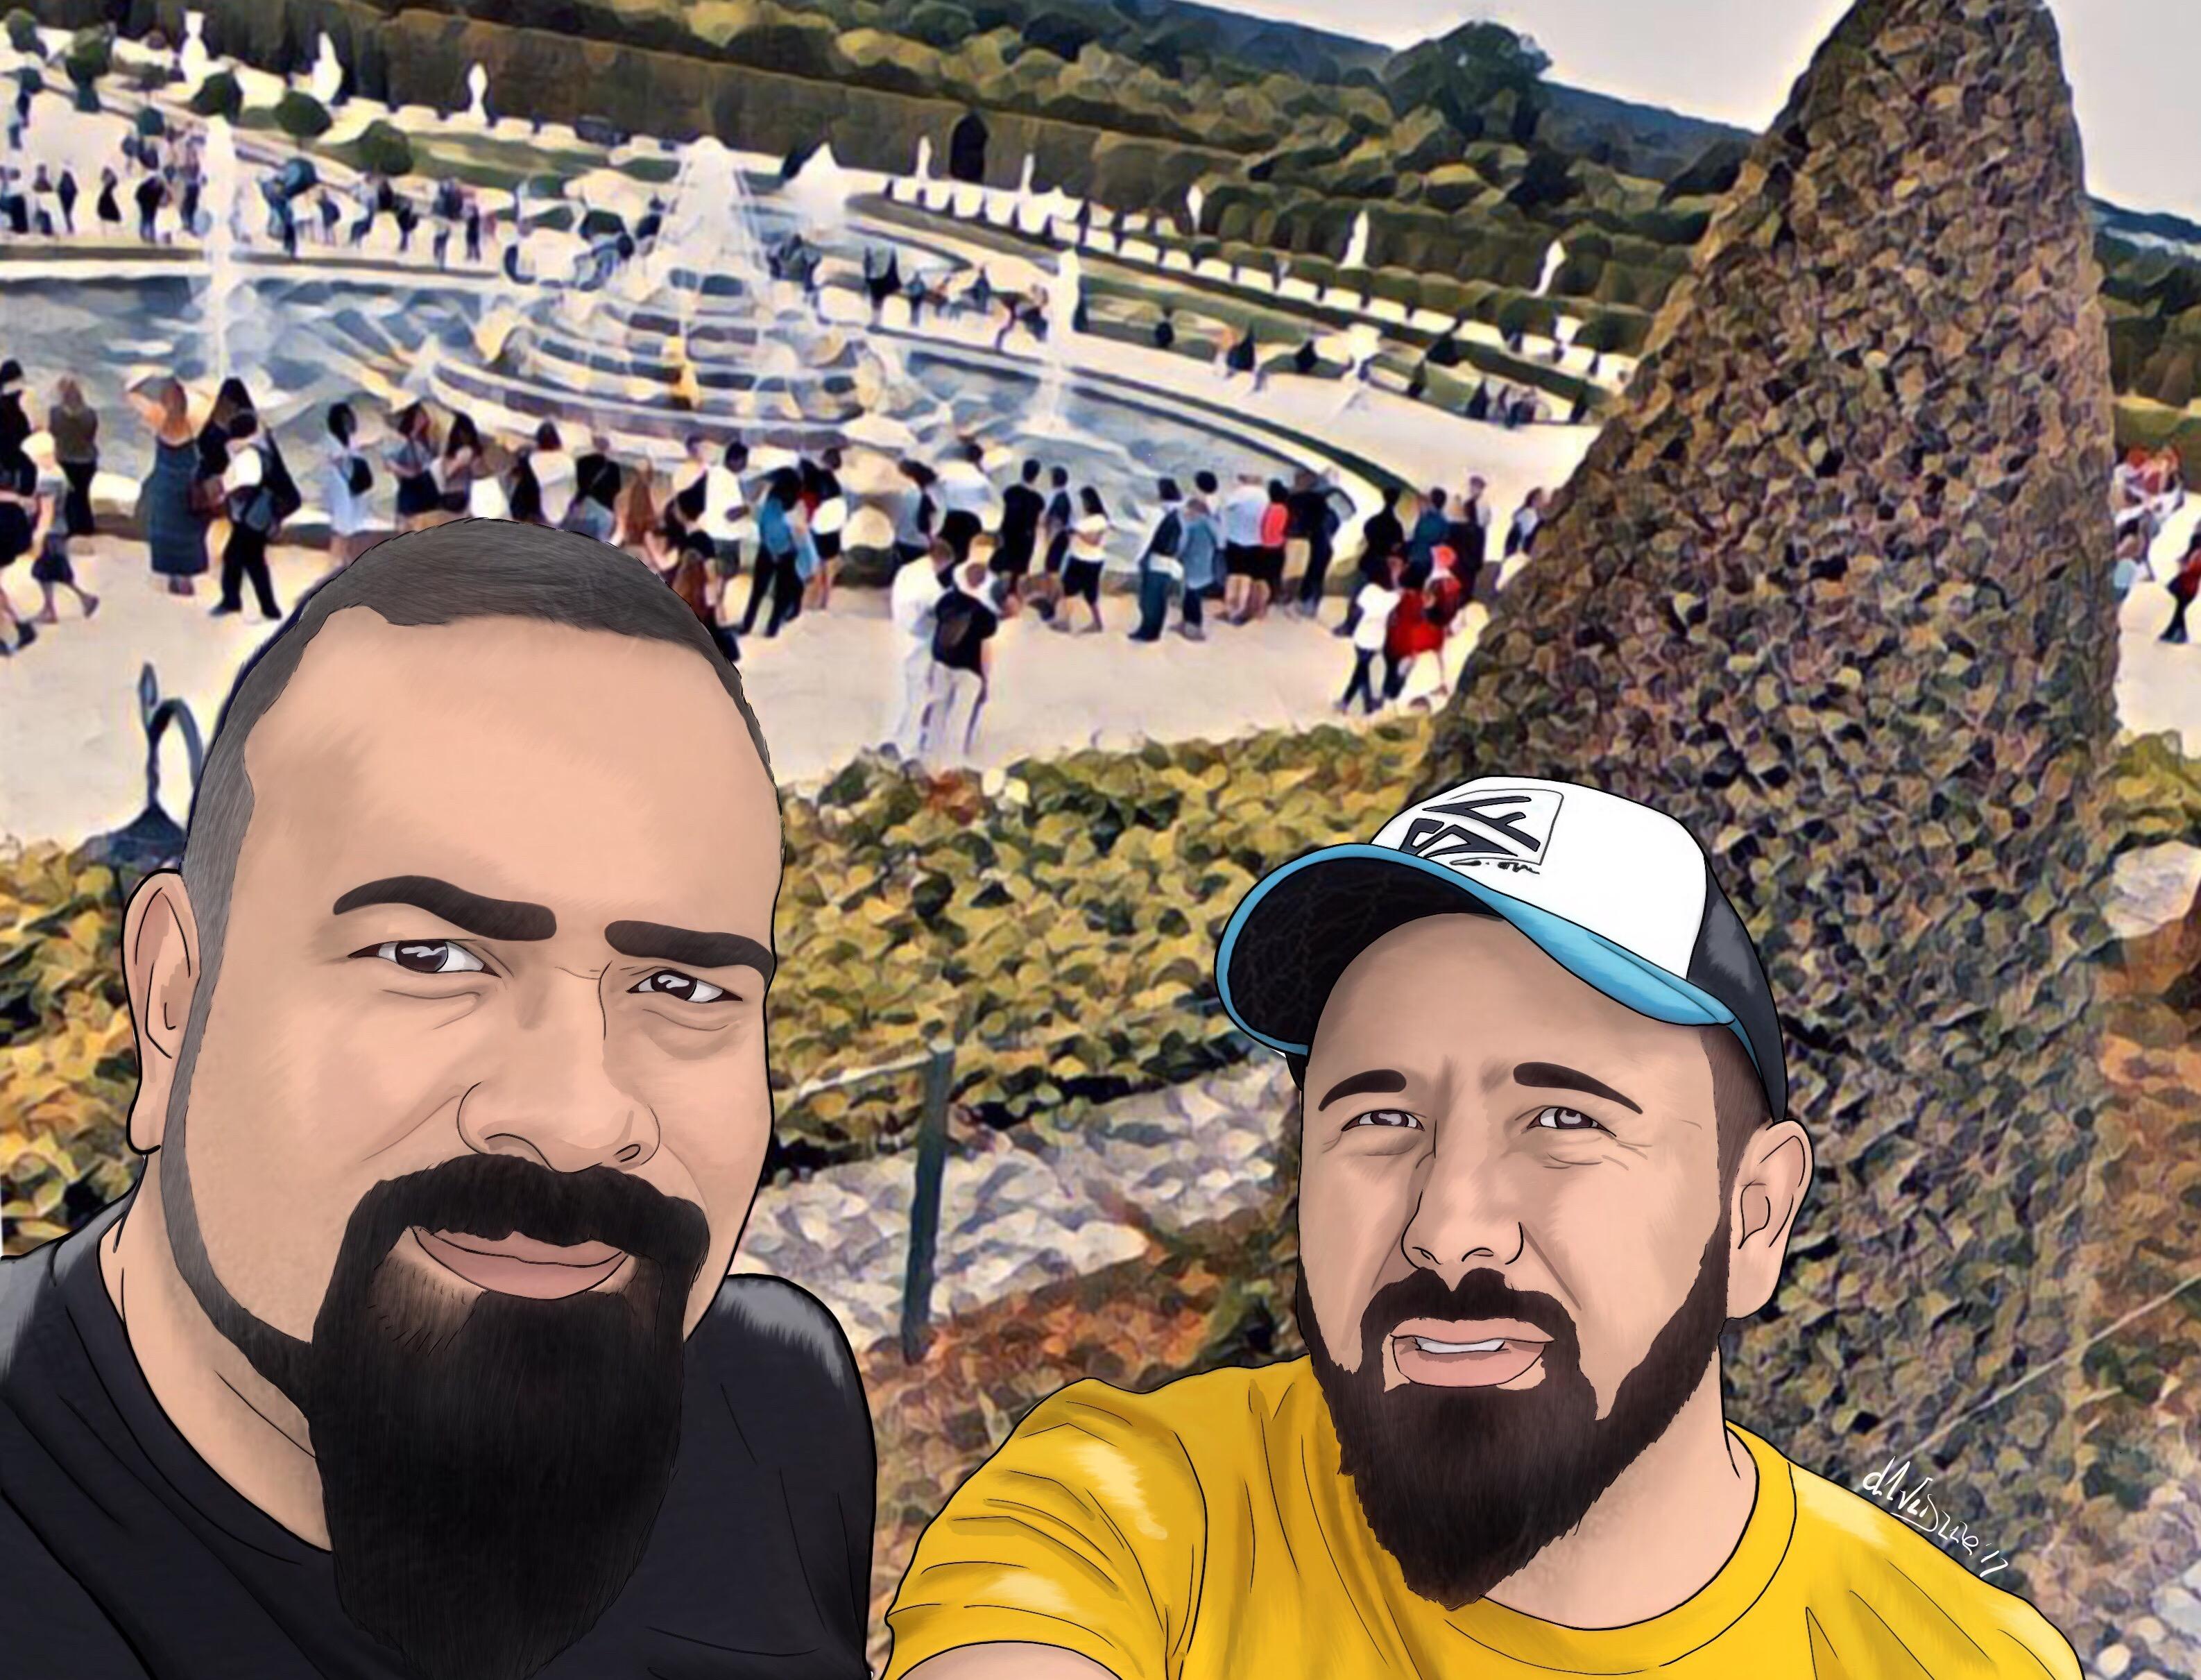 Retratos__David_Pallás_Gozalo_gaycouple.